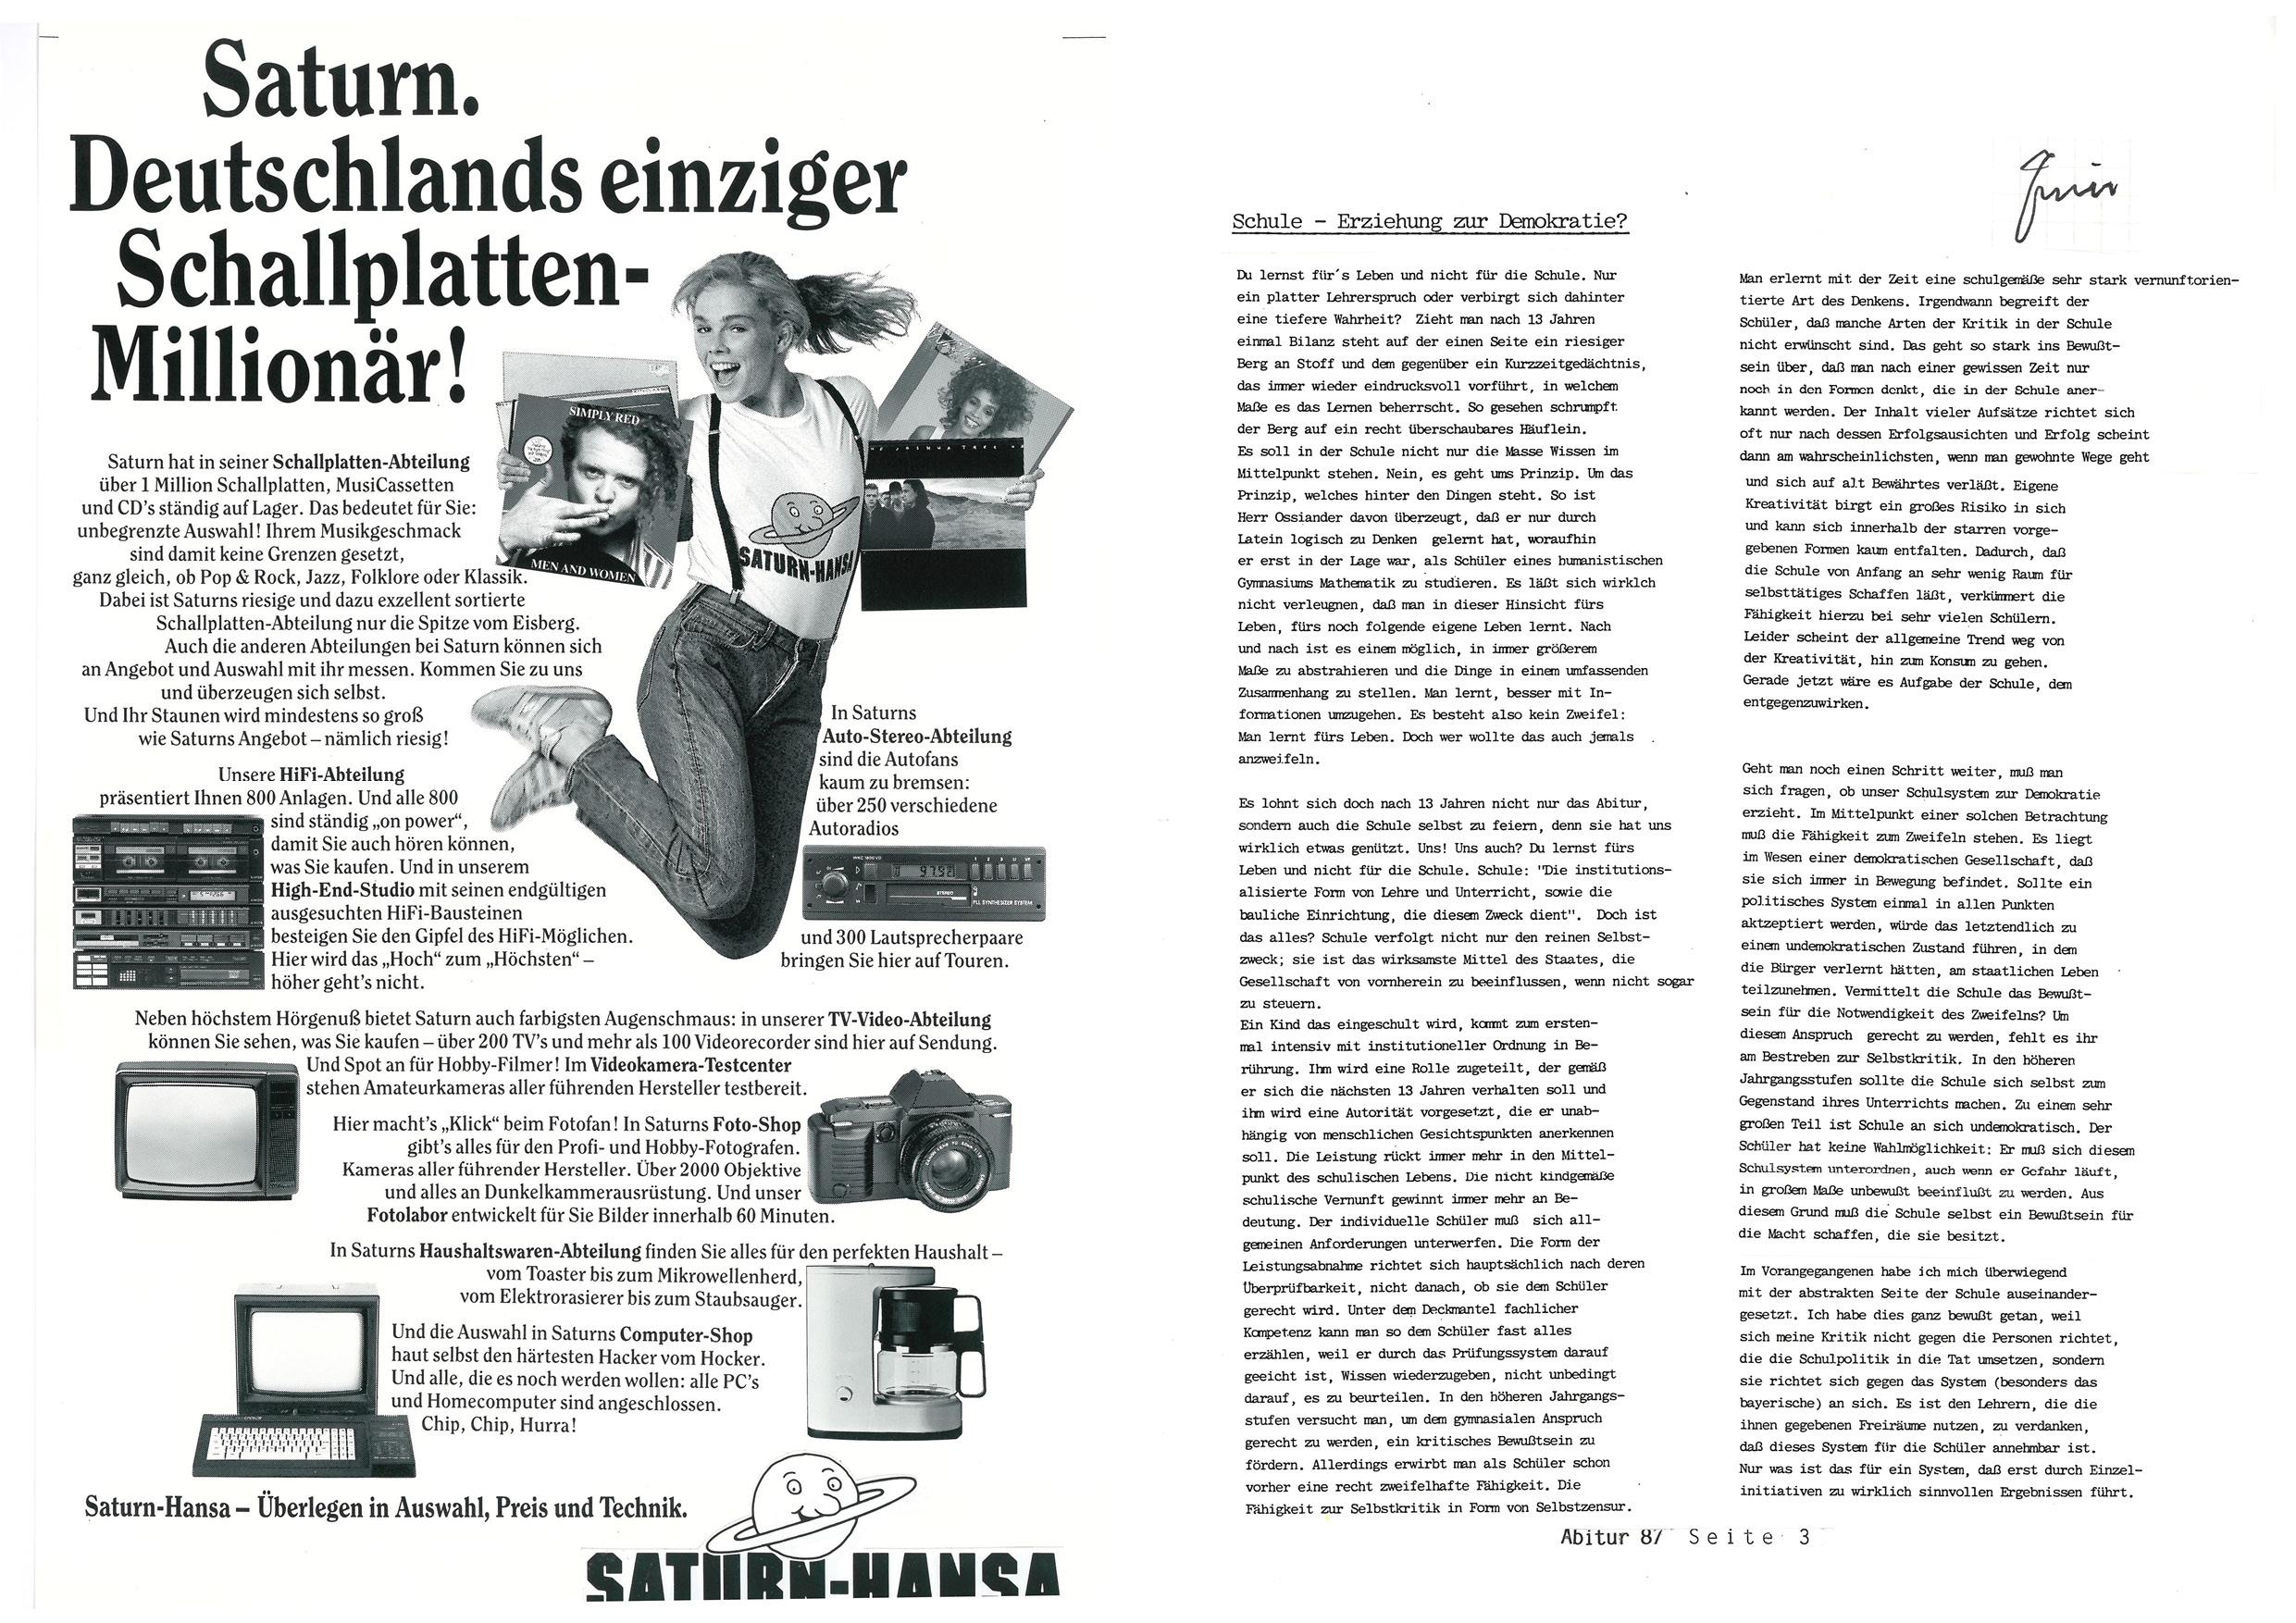 Abiturzeitung198702